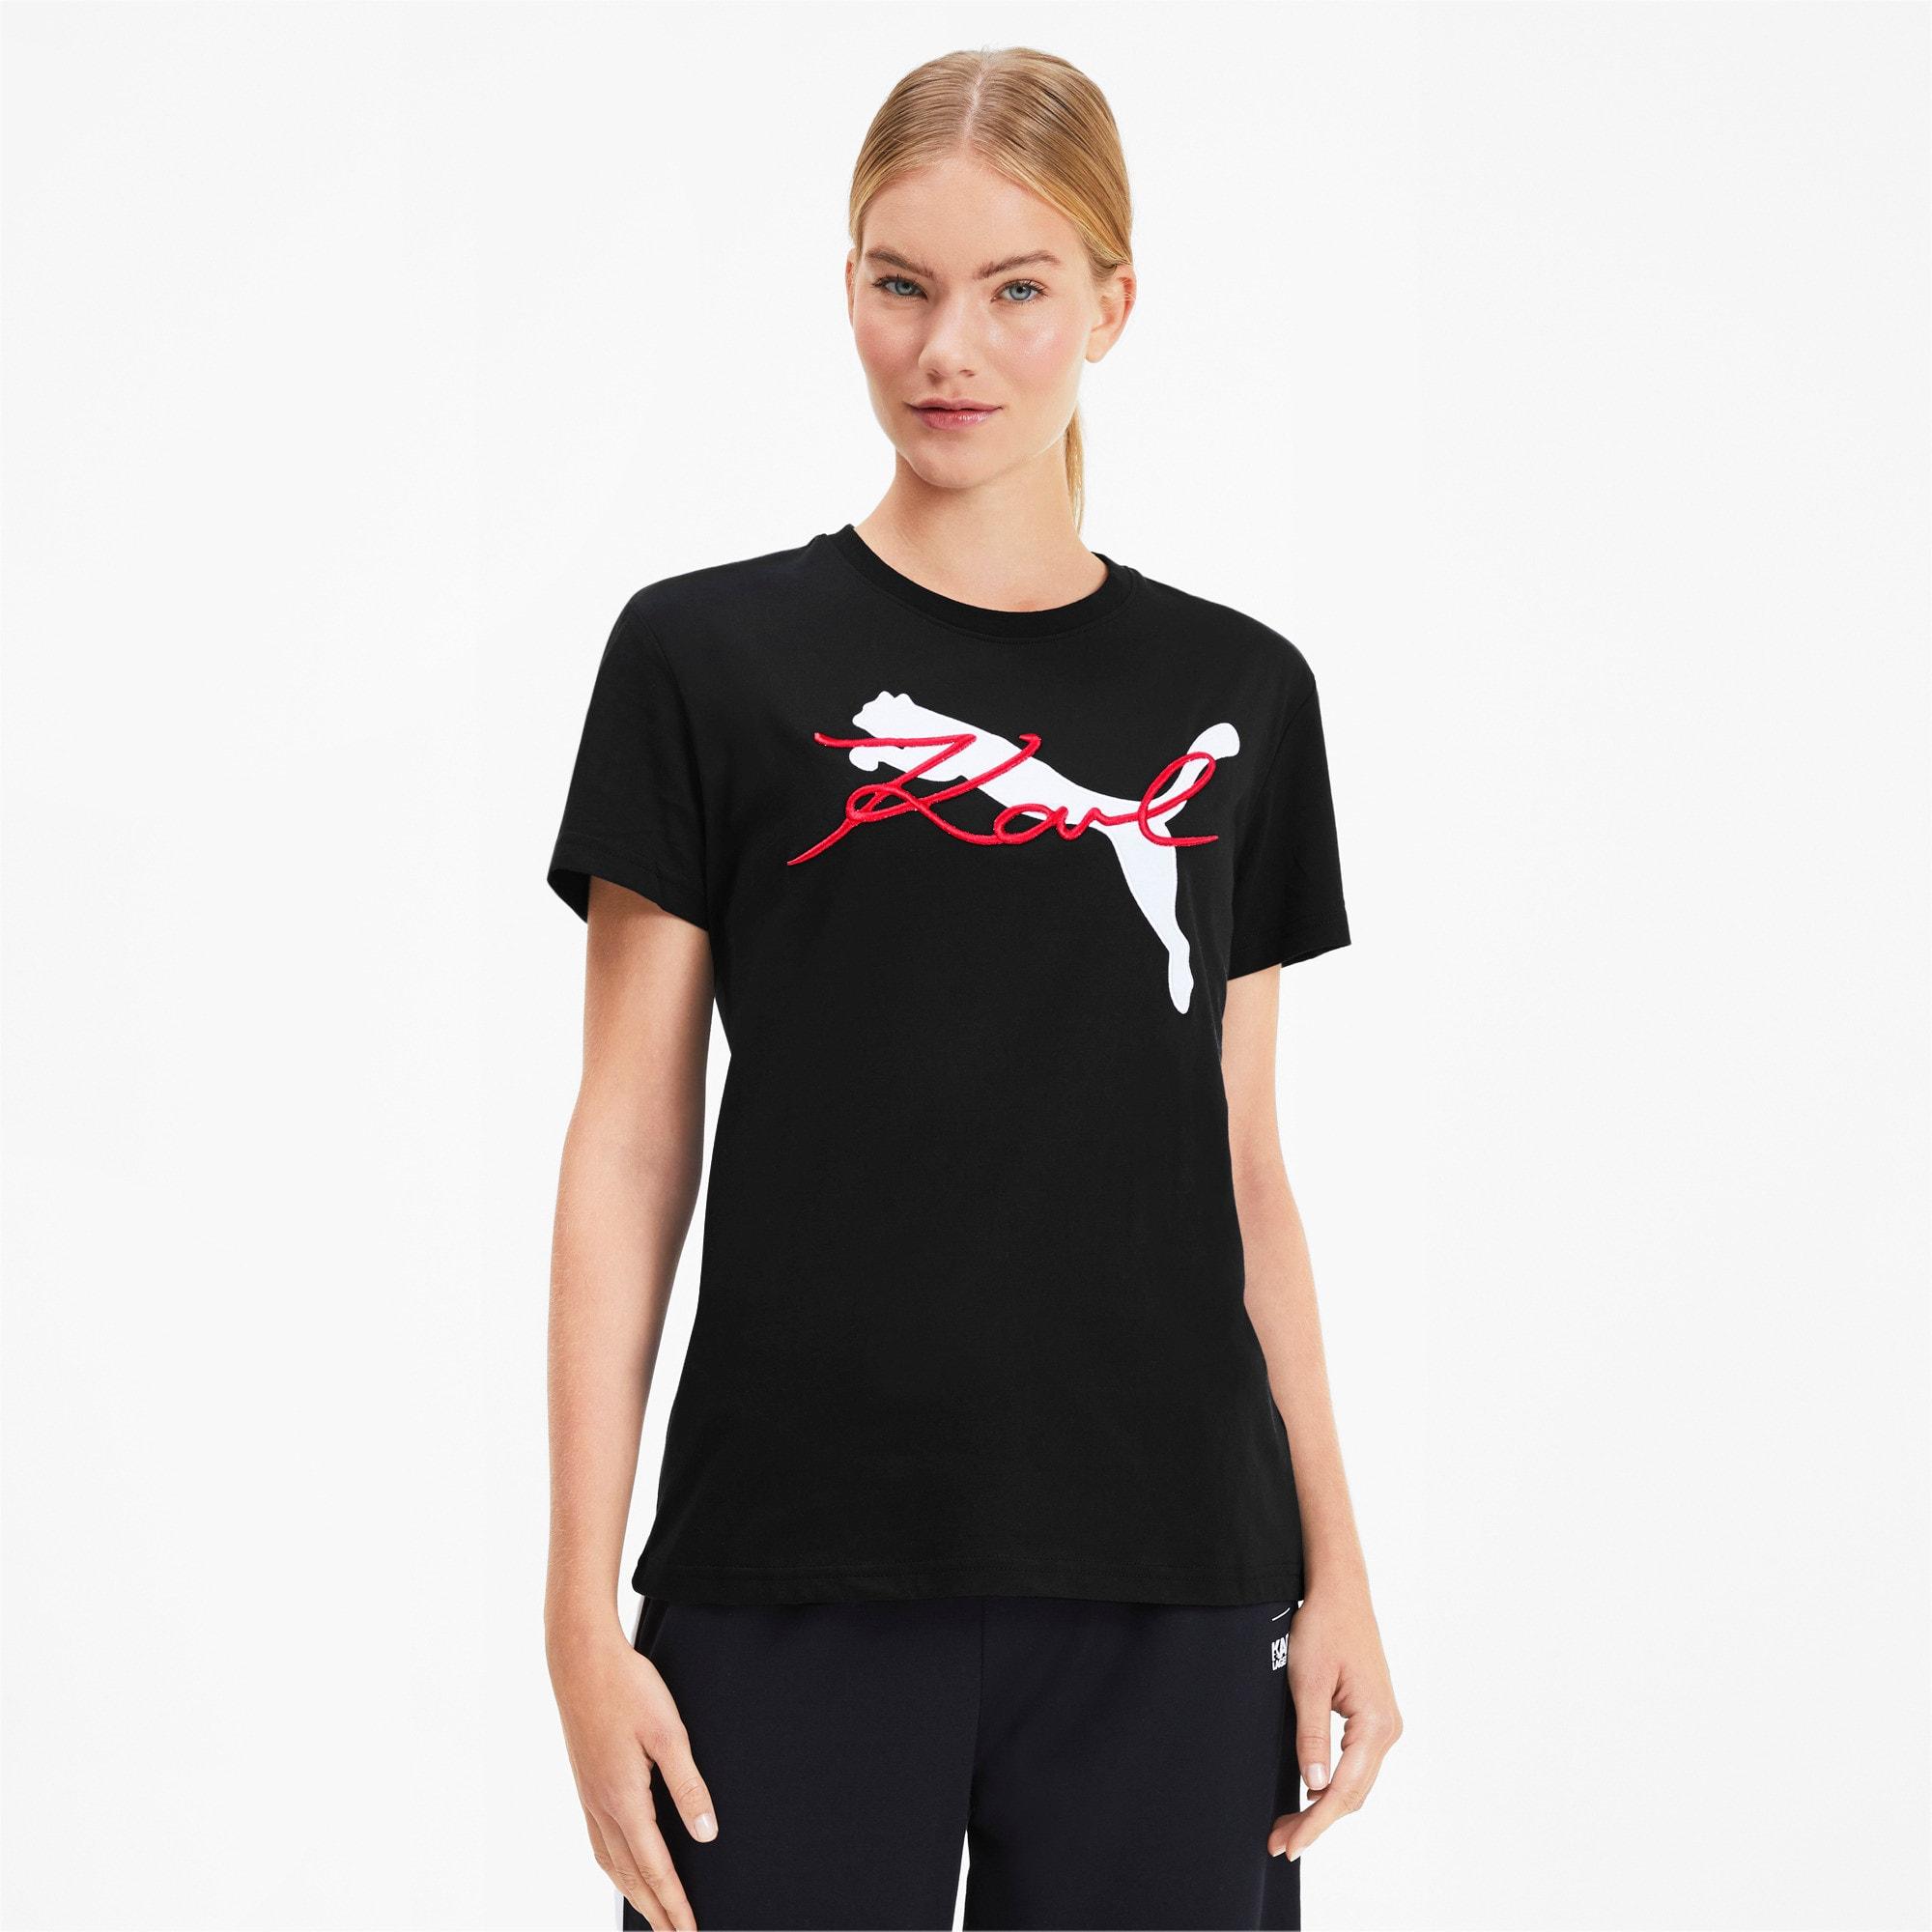 PUMA x KARL LAGERFELD T-shirt voor Dames, Zwart, Maat L